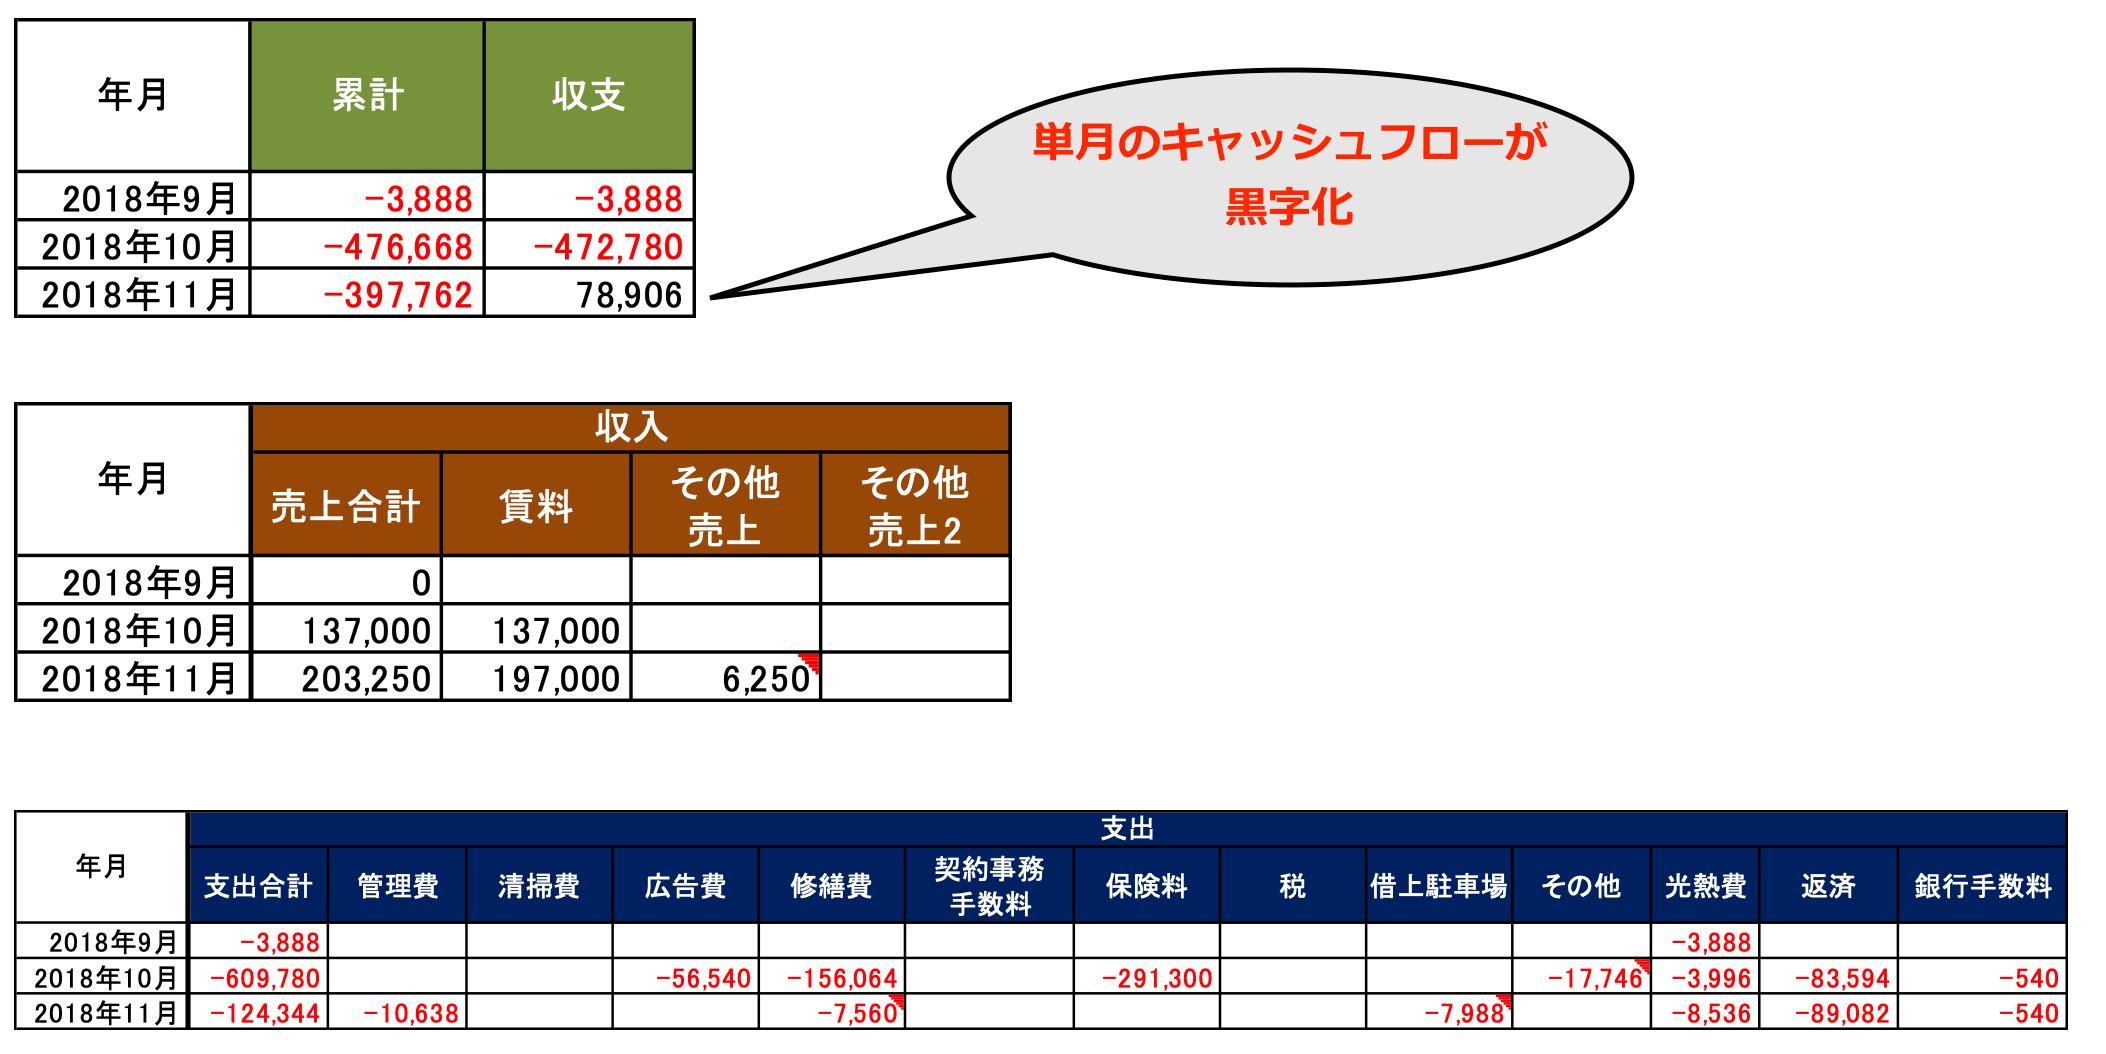 第6号物件 収支と累計 詳細